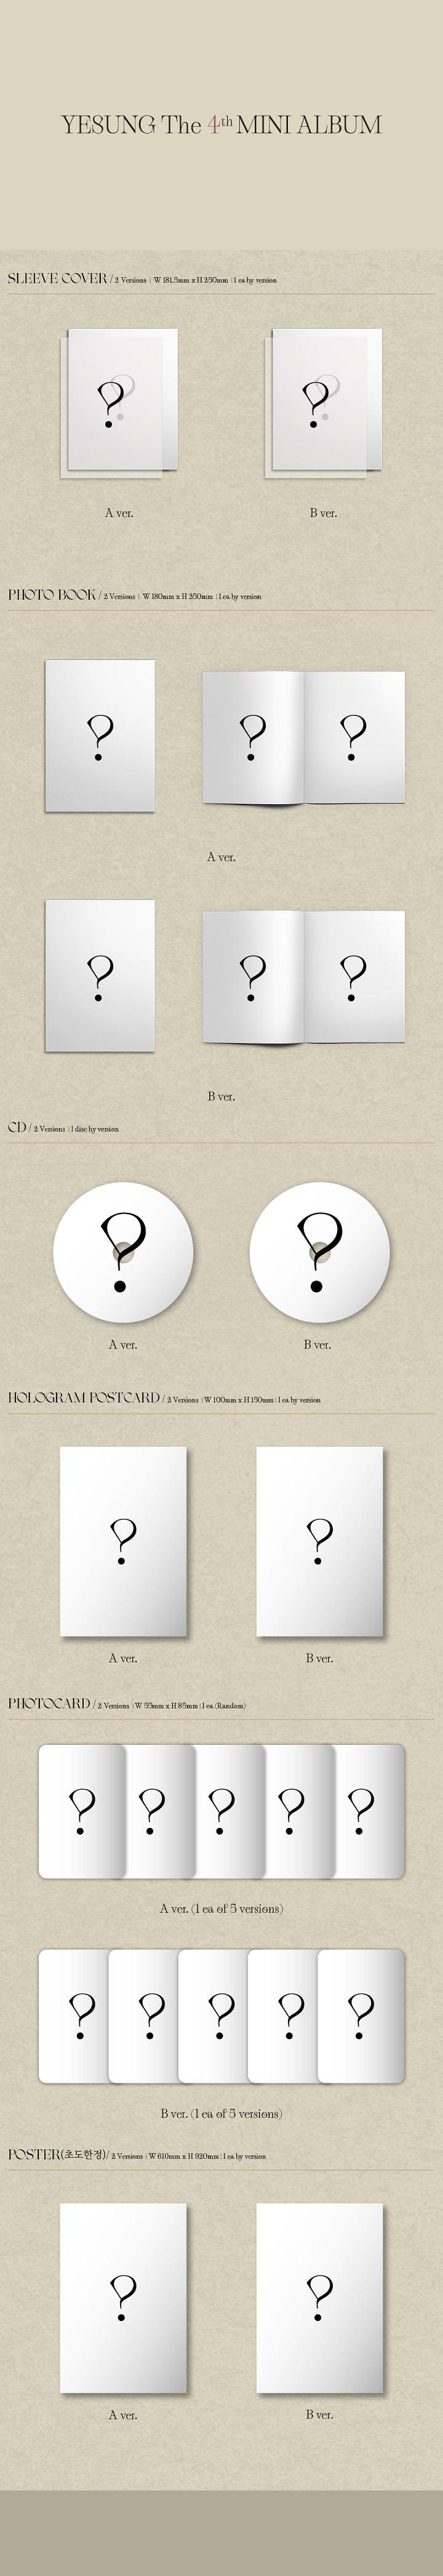 YESUNG - 4th Mini [Phantom Pain] (Photo Book Ver.) (Random Ver.)